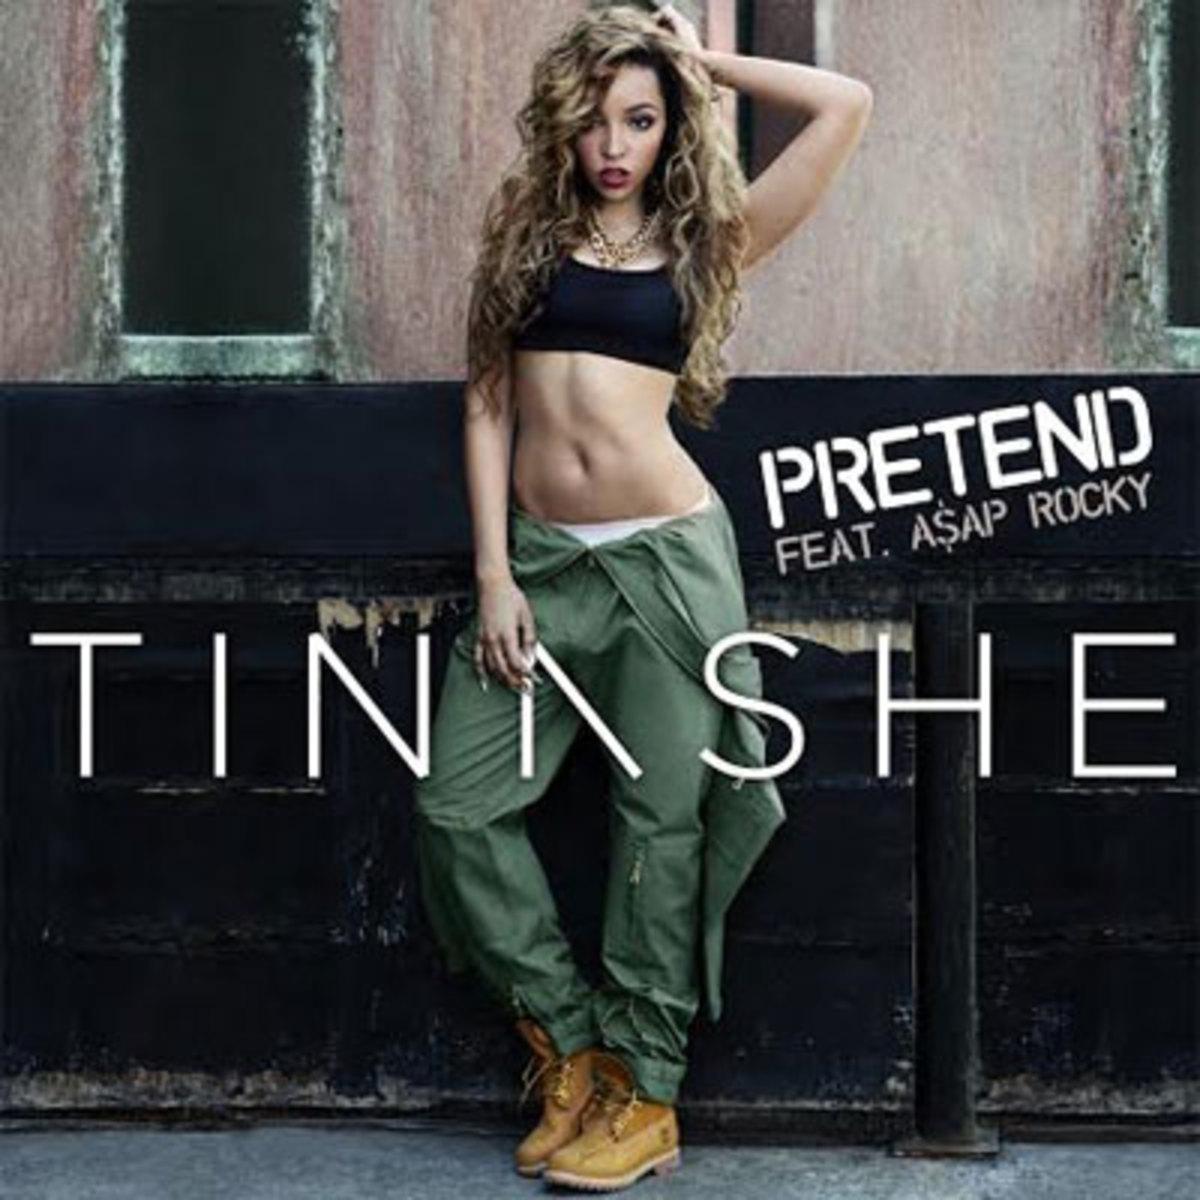 tinashe-pretend.jpg